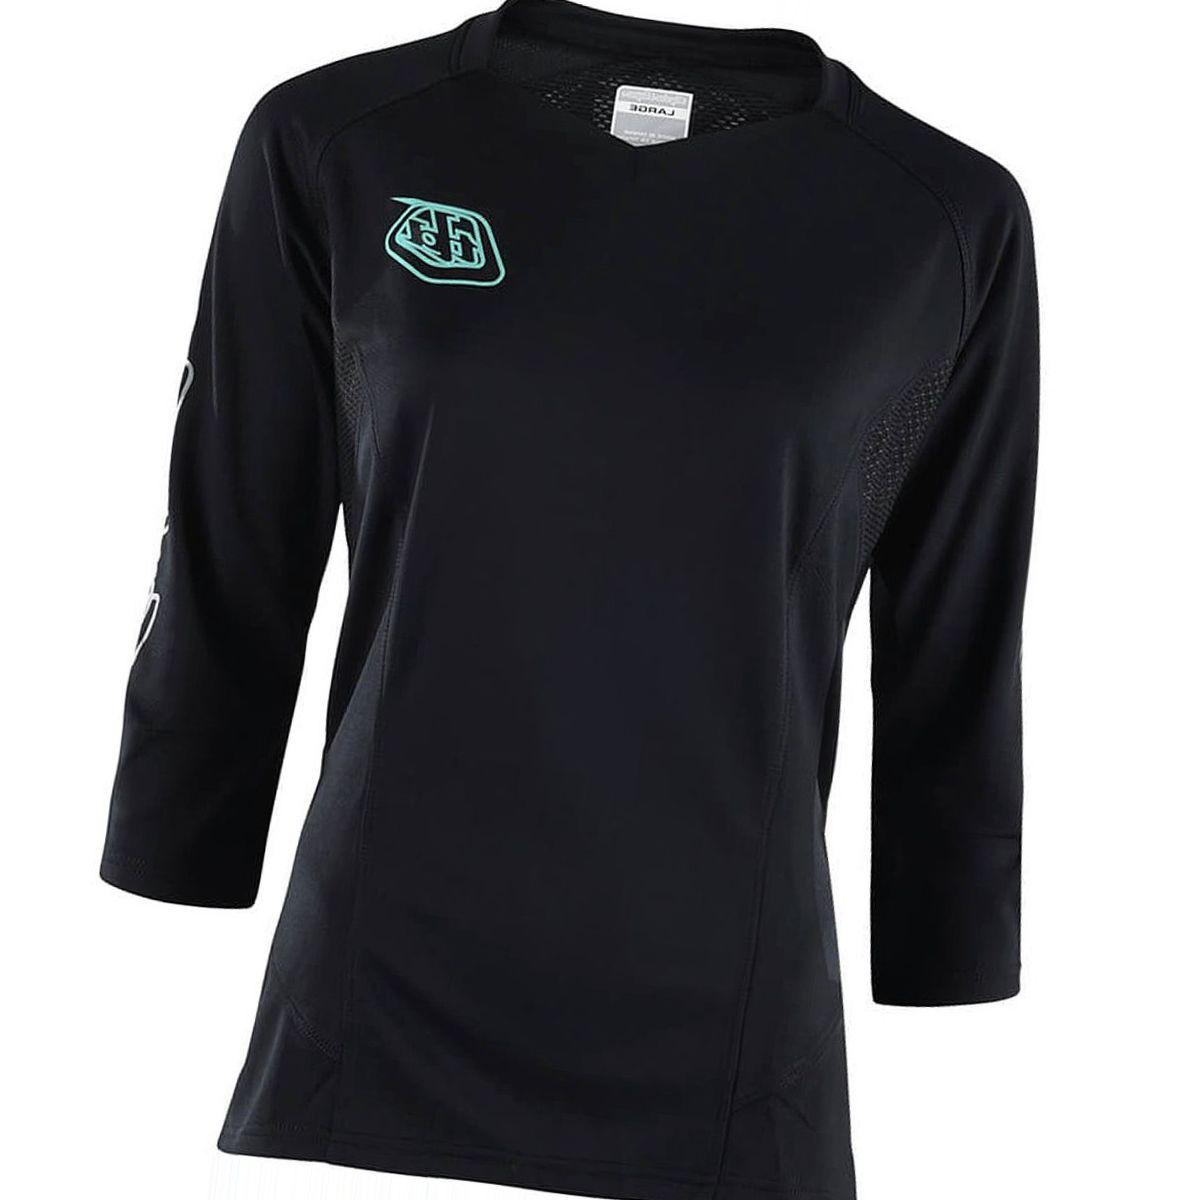 Troy Lee Designs Ruckus 3/4-Sleeve Jersey - Women's